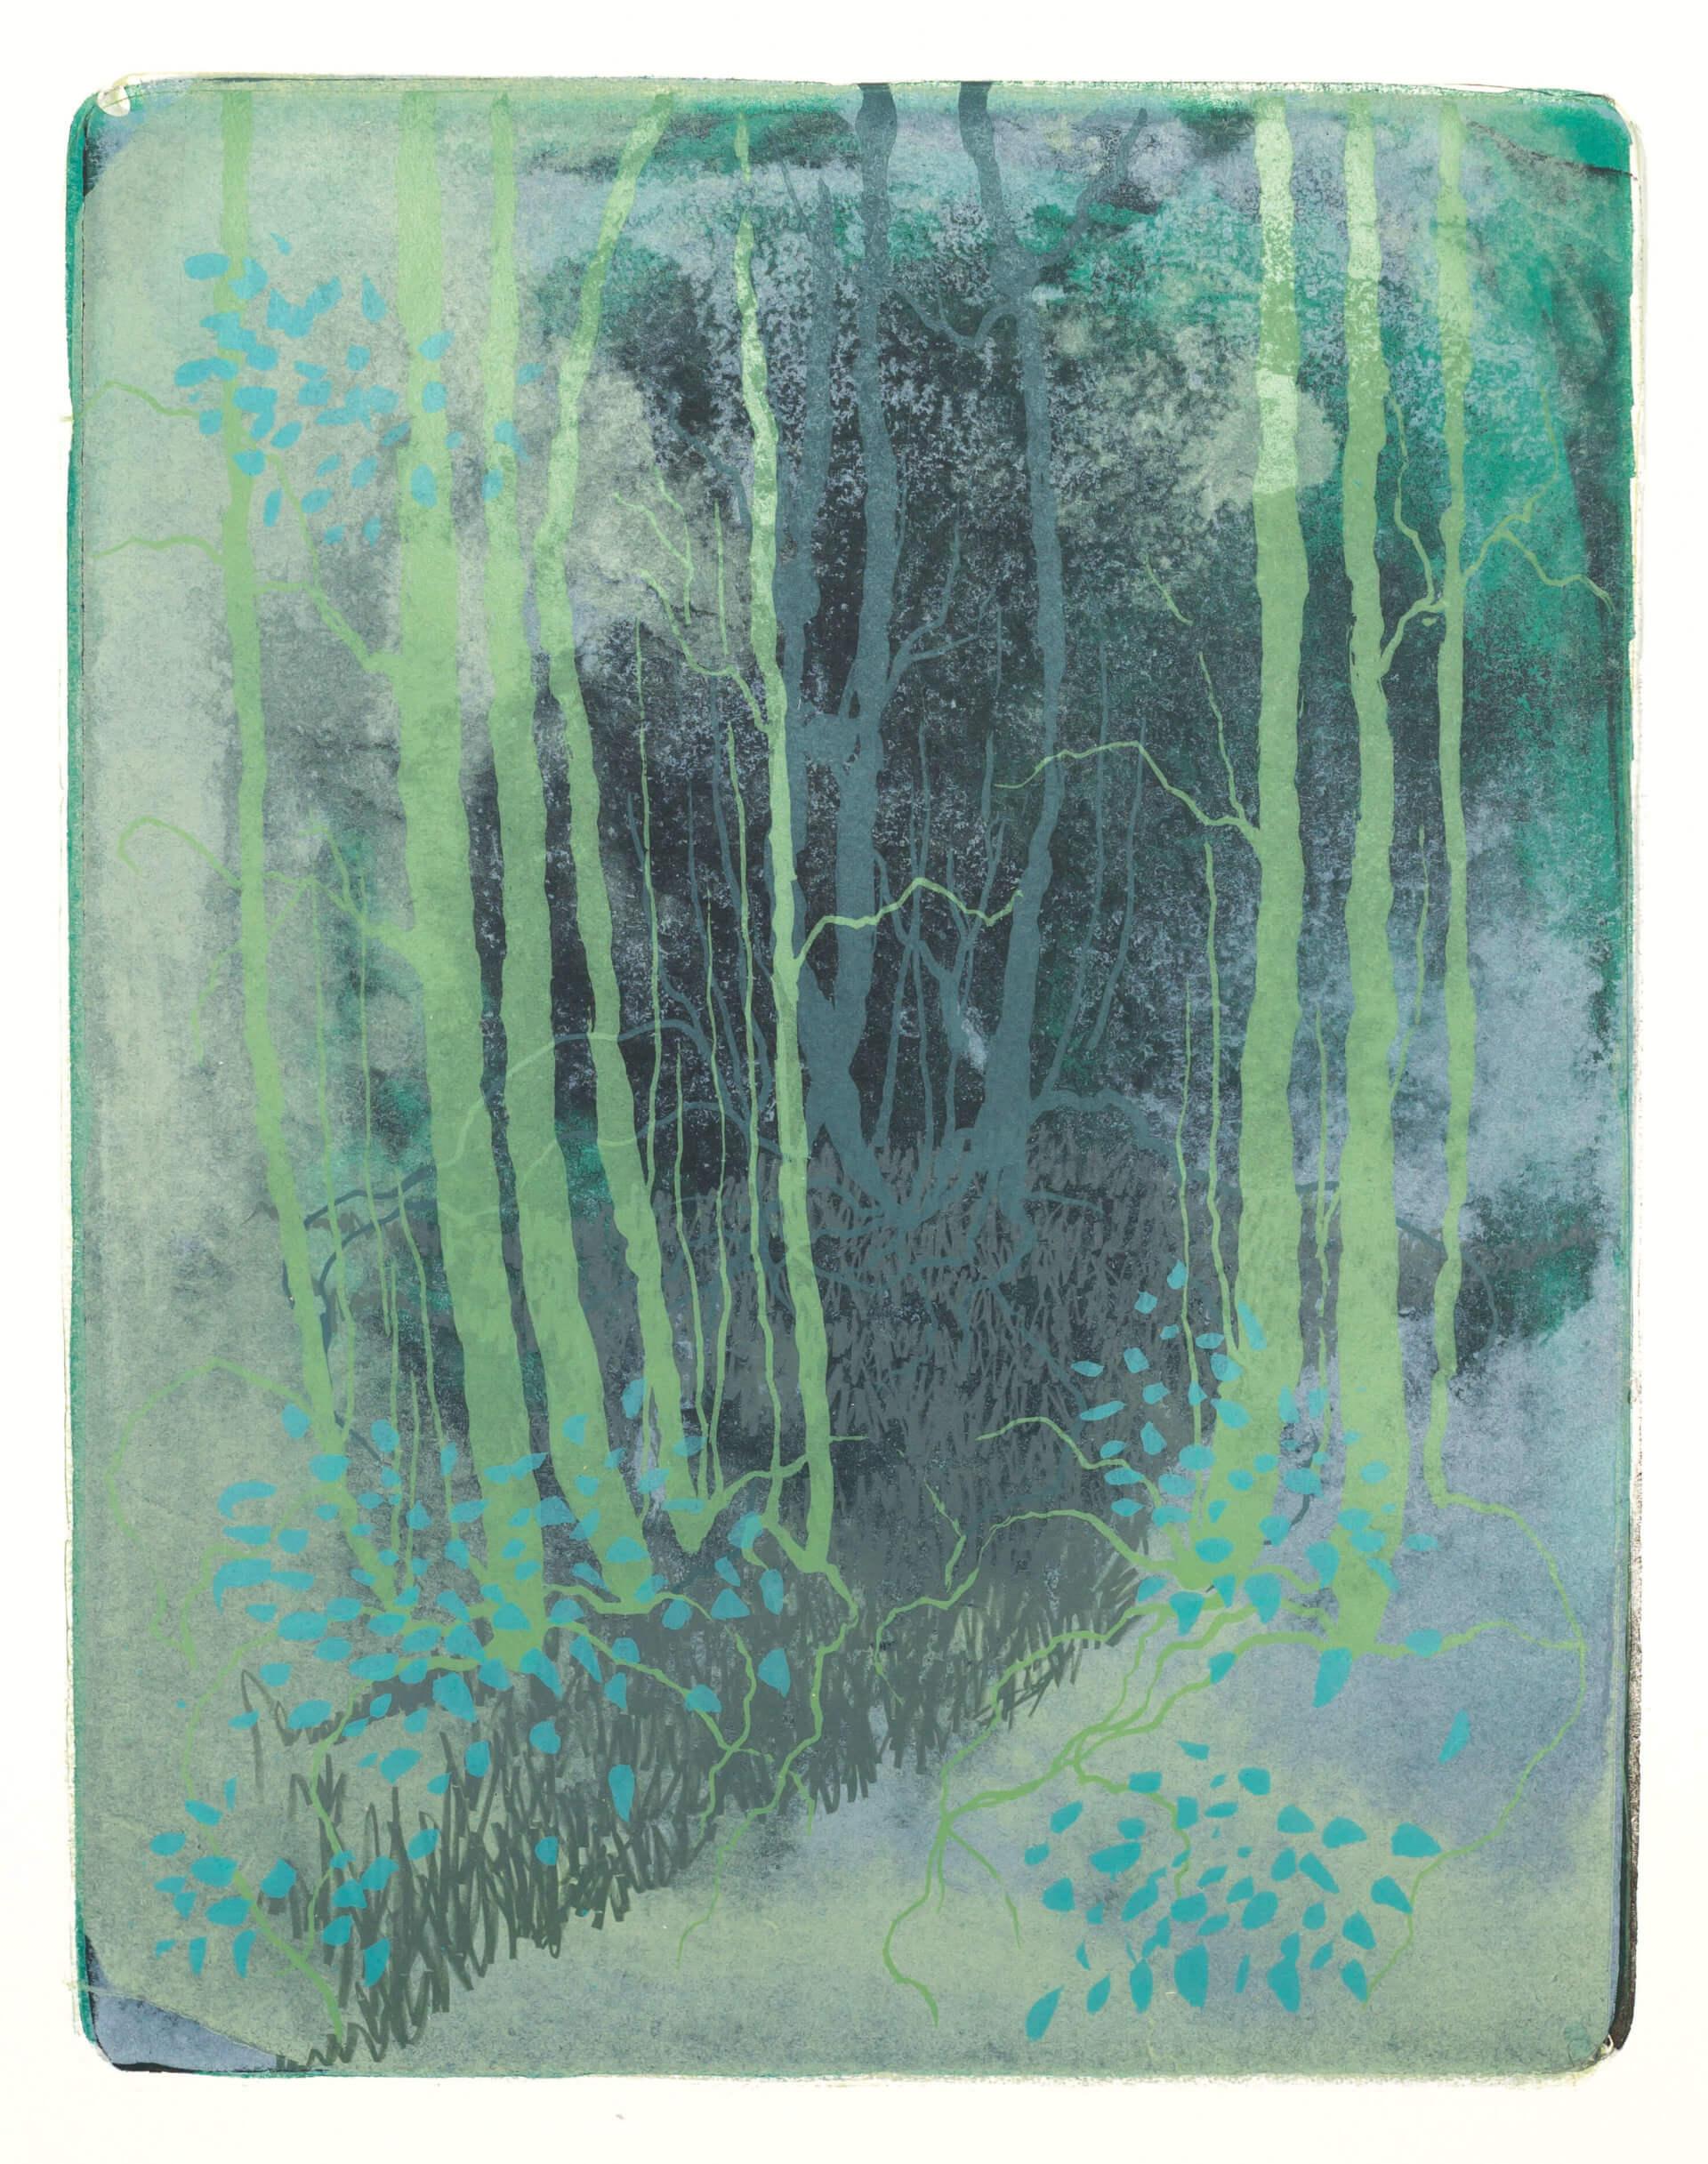 Wald X(K)-II, 2018, Farblithographie, Unikat, 50x40 cm.